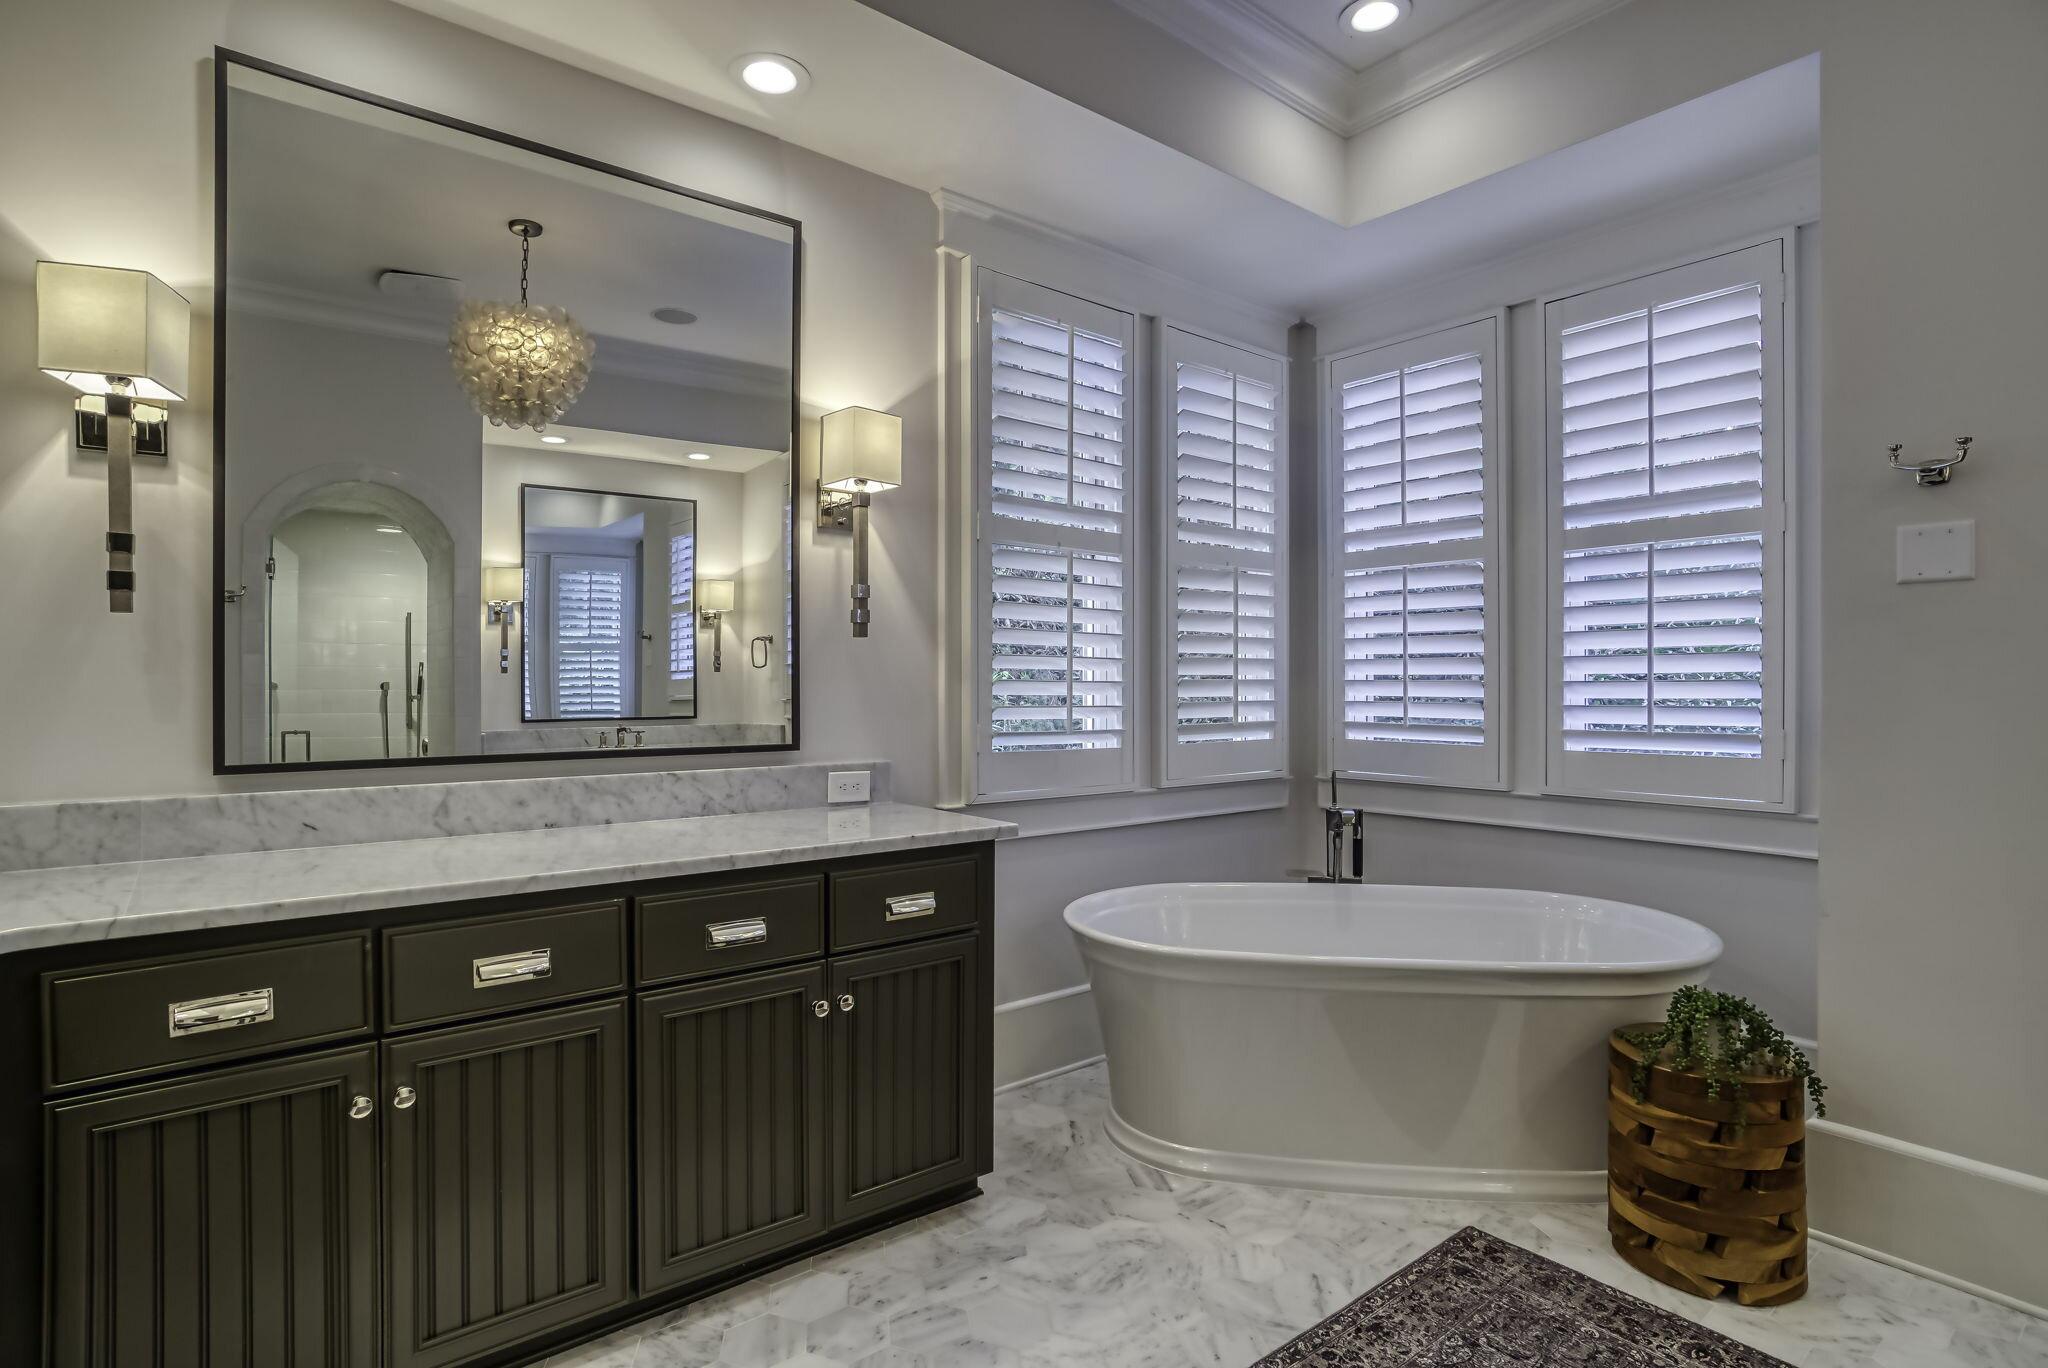 27-web-or-mls-4900 Carmel Park Dr Owner Suite Bath 1.jpg